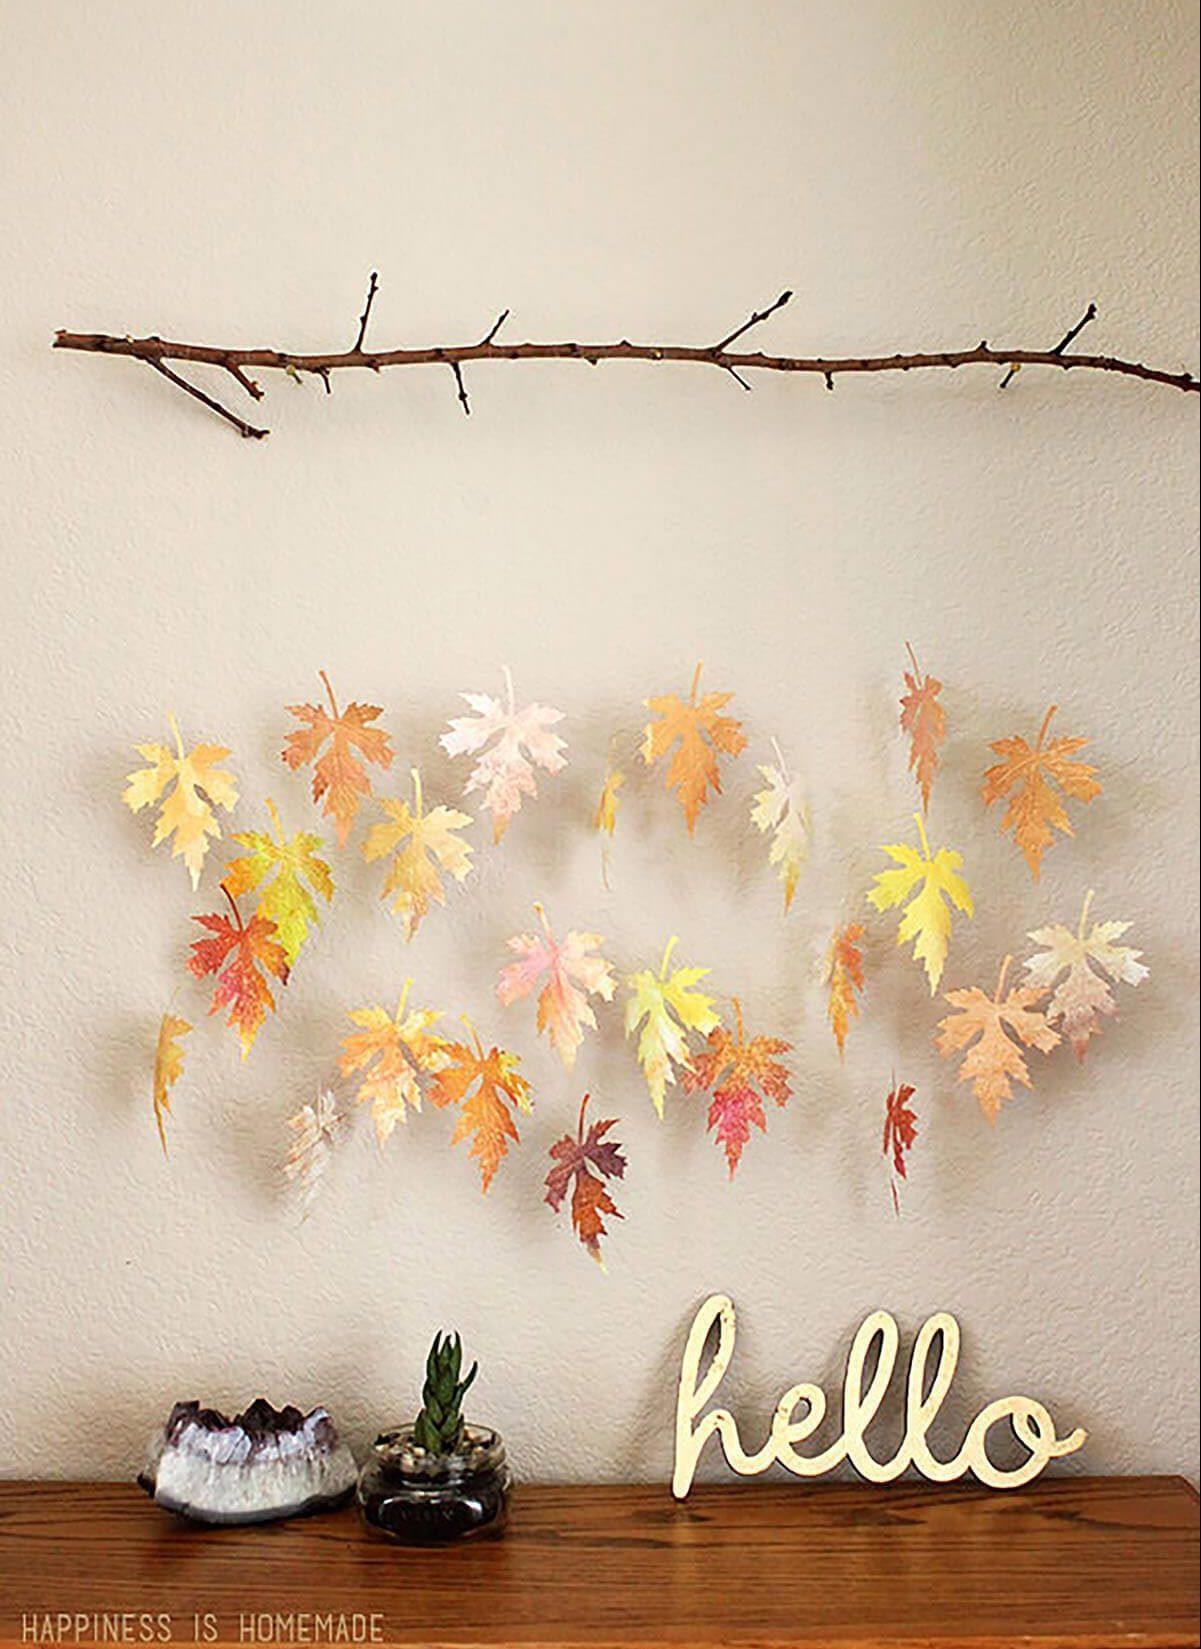 5 Home Decor Tricks To Make This Fall Even More Hygge By Doris Leslie Blau